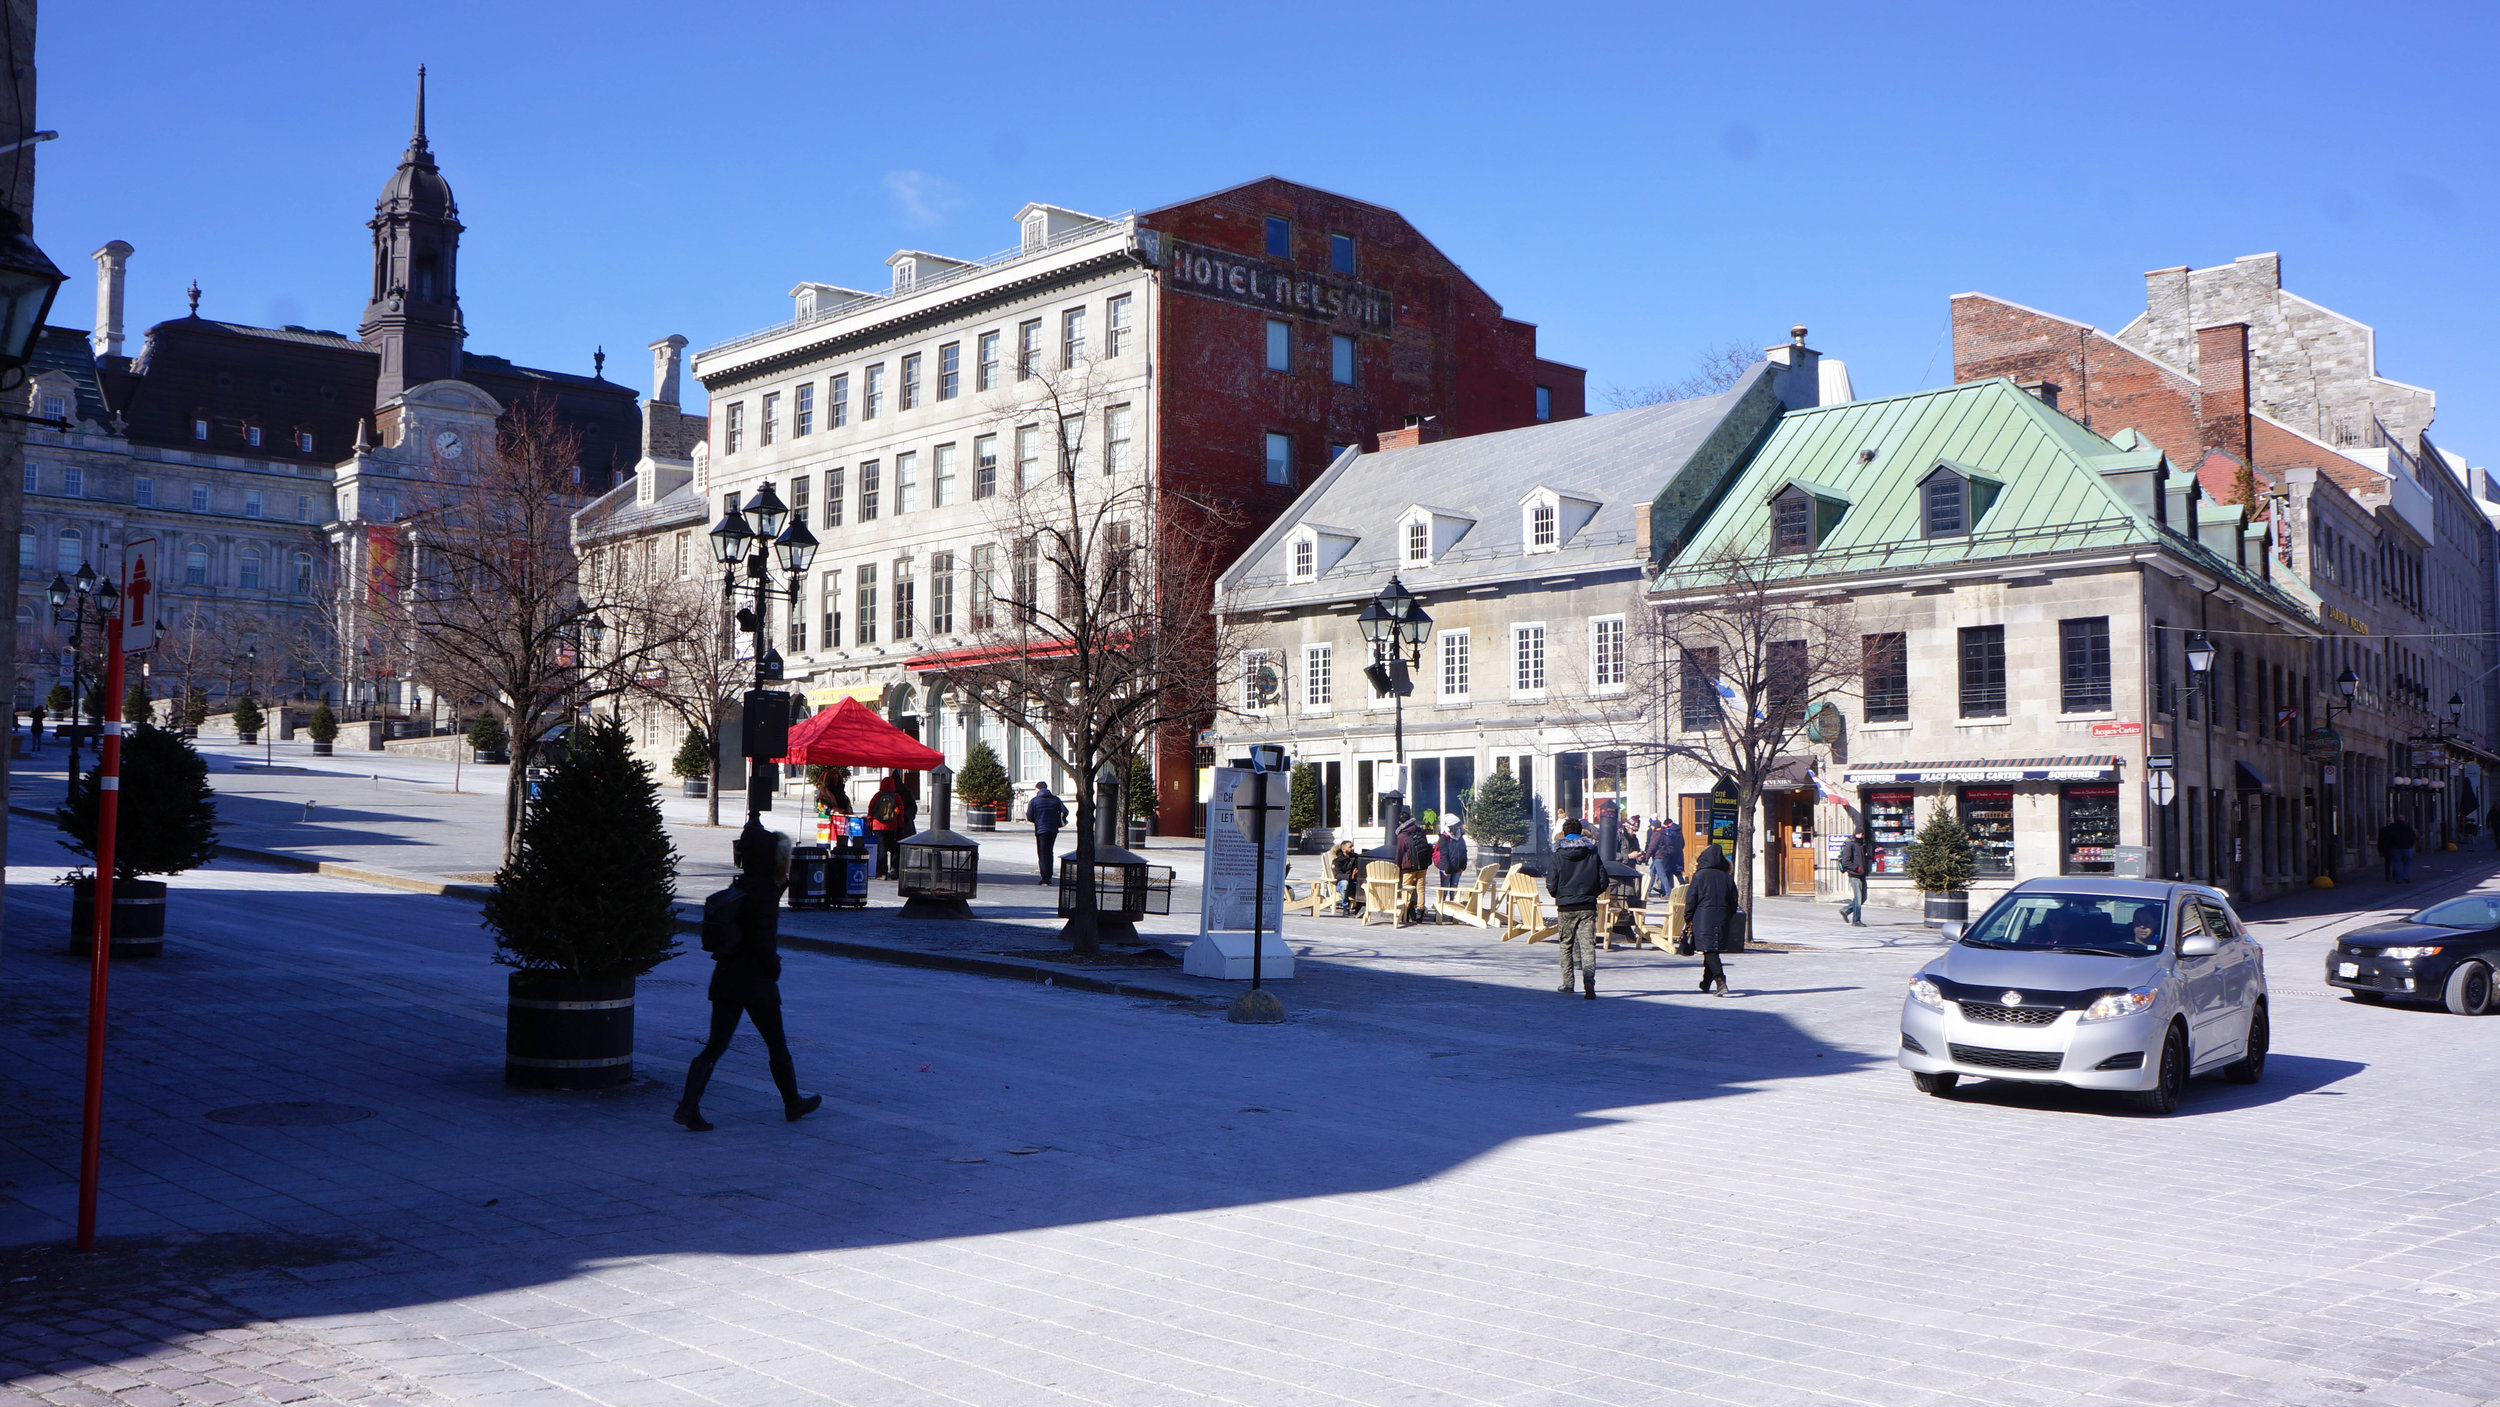 Views of Place Jacques-Cartier